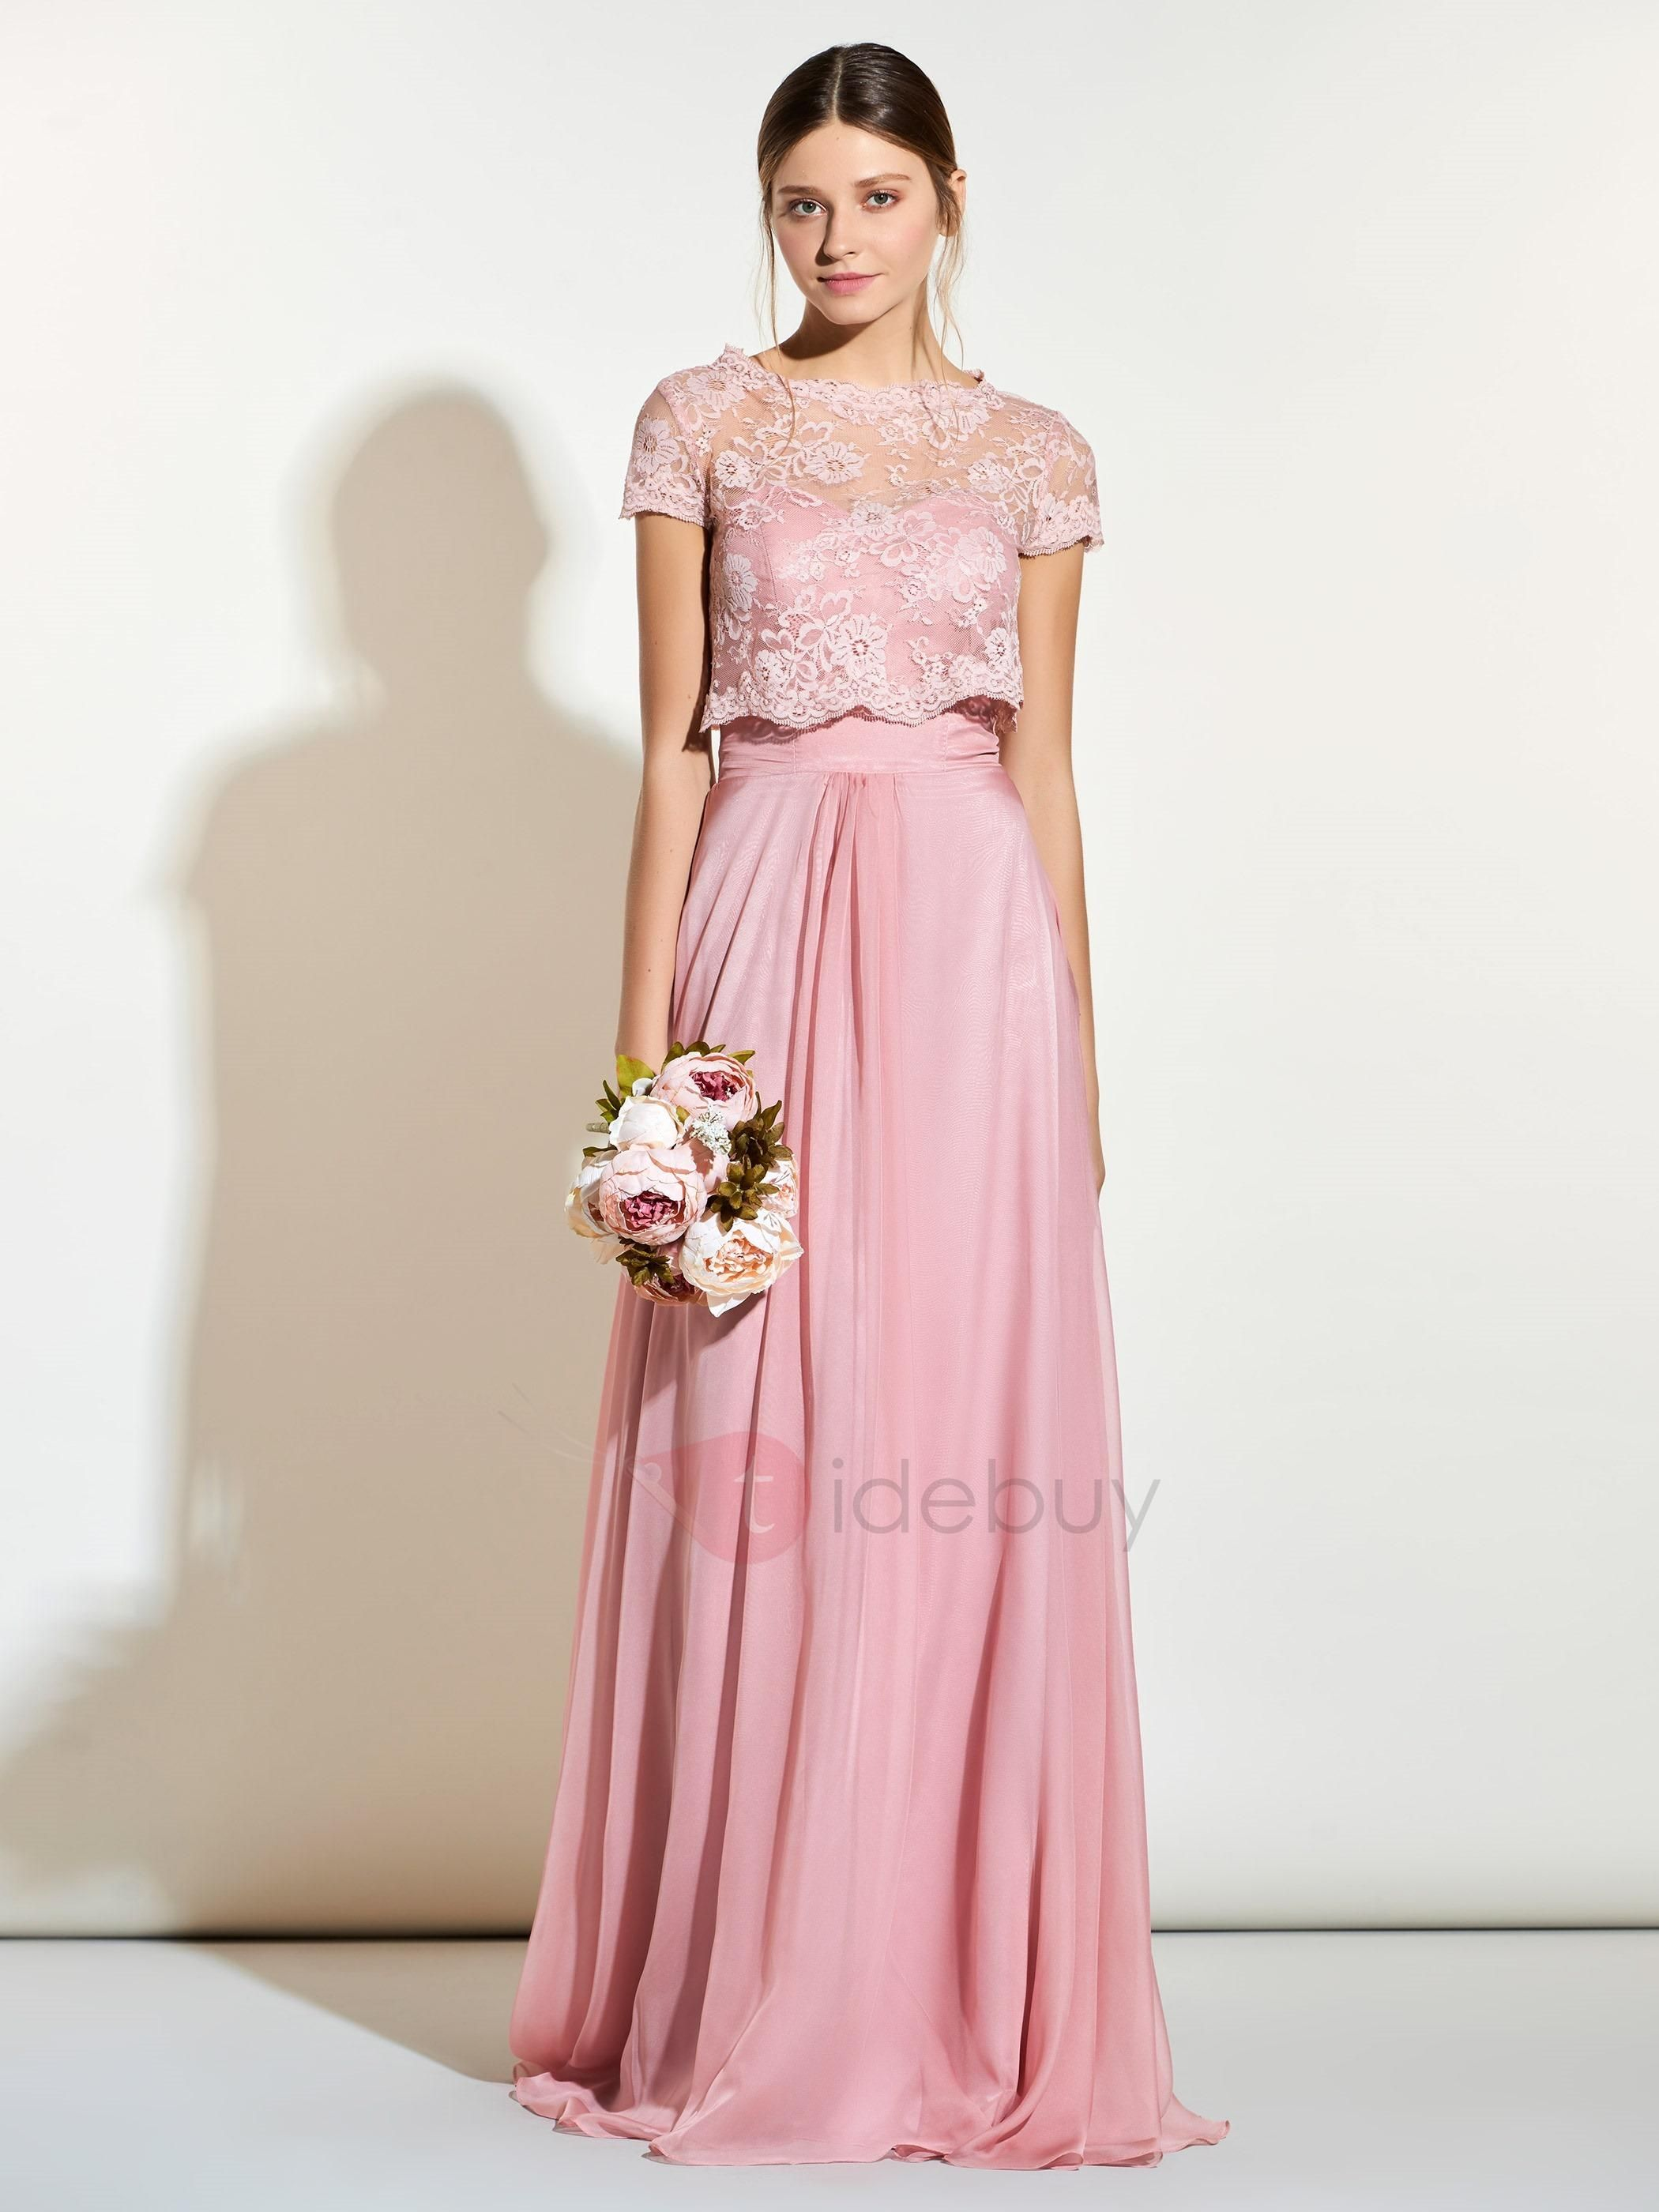 Tidebuy tidebuy beautiful sweetheart long bridesmaid dress with